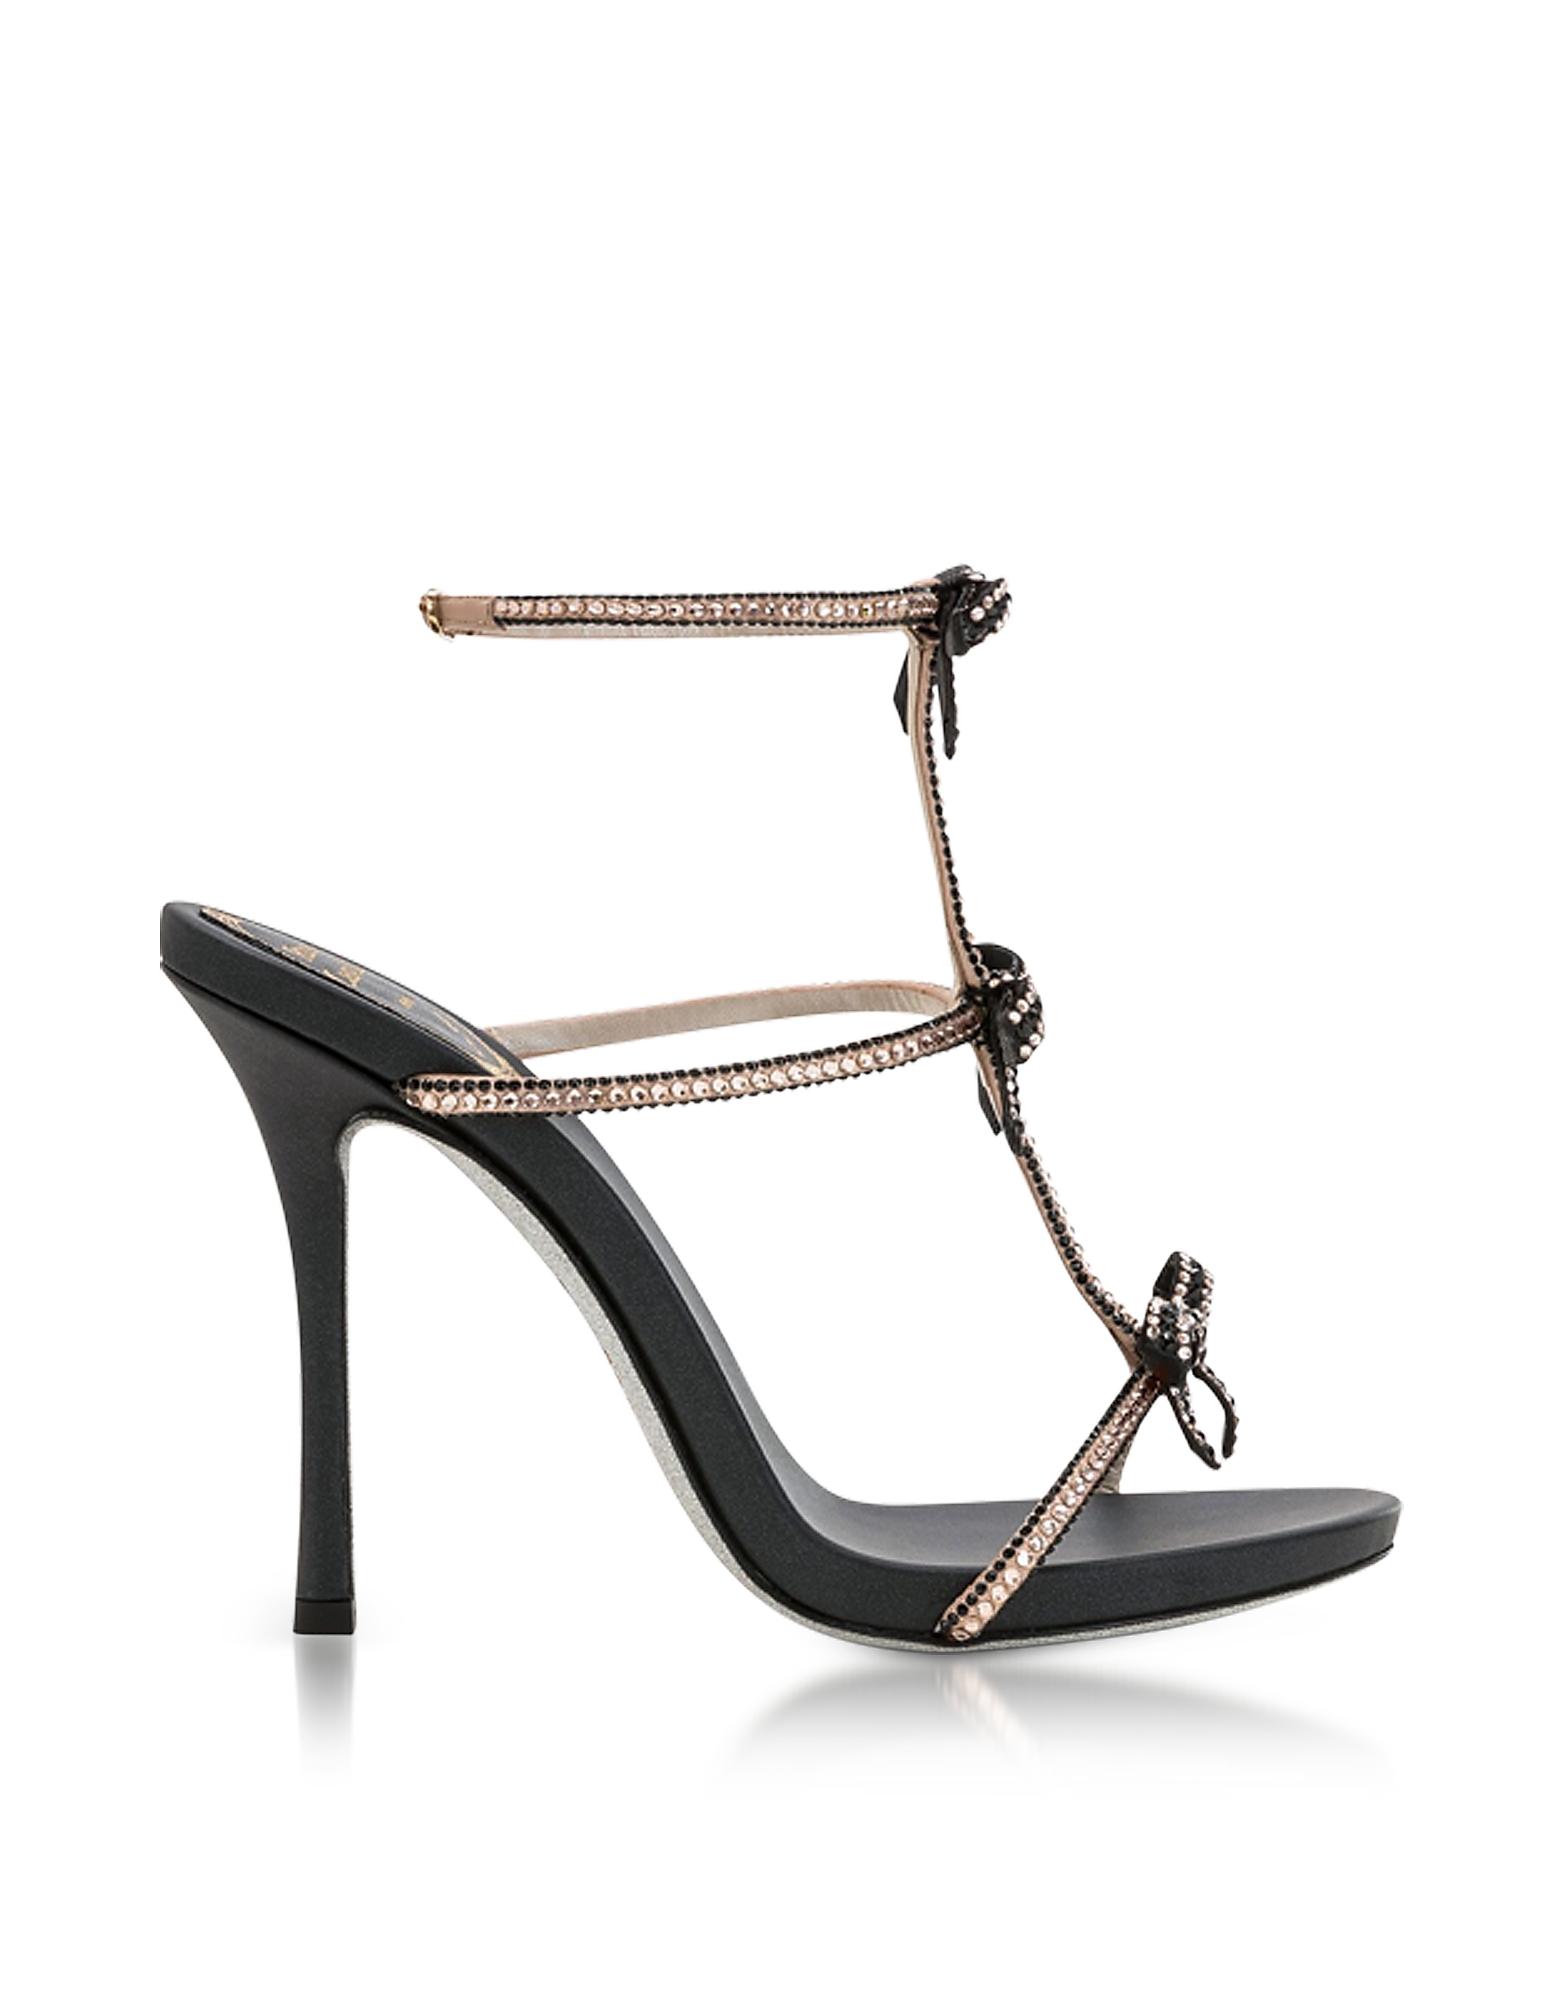 Rene Caovilla Shoes, Caterina Black/Nude Satin T-Bar Sandals w/Crystals